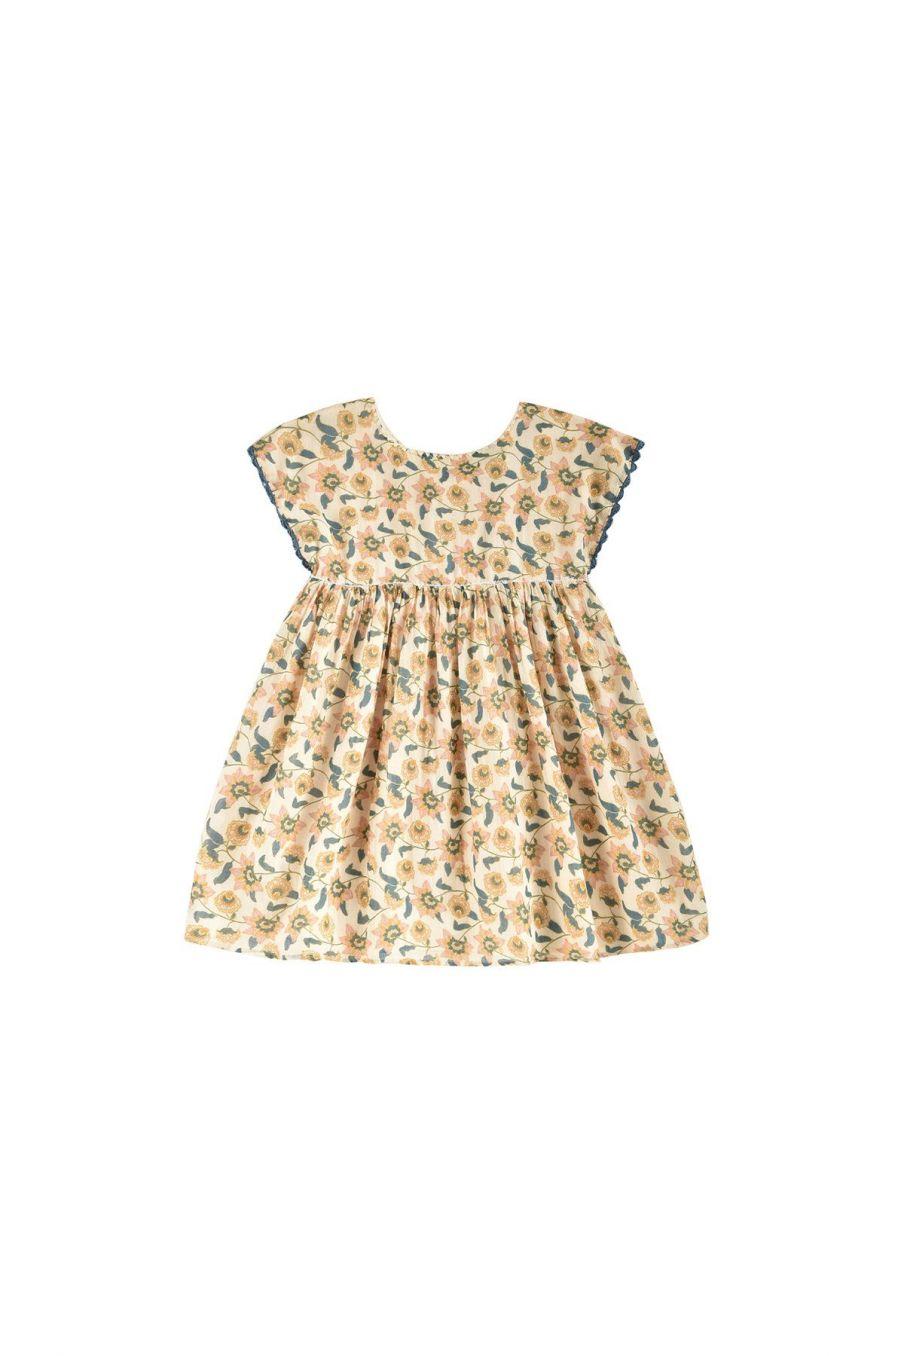 boheme chic vintage robe fille tapalpa cream flowers